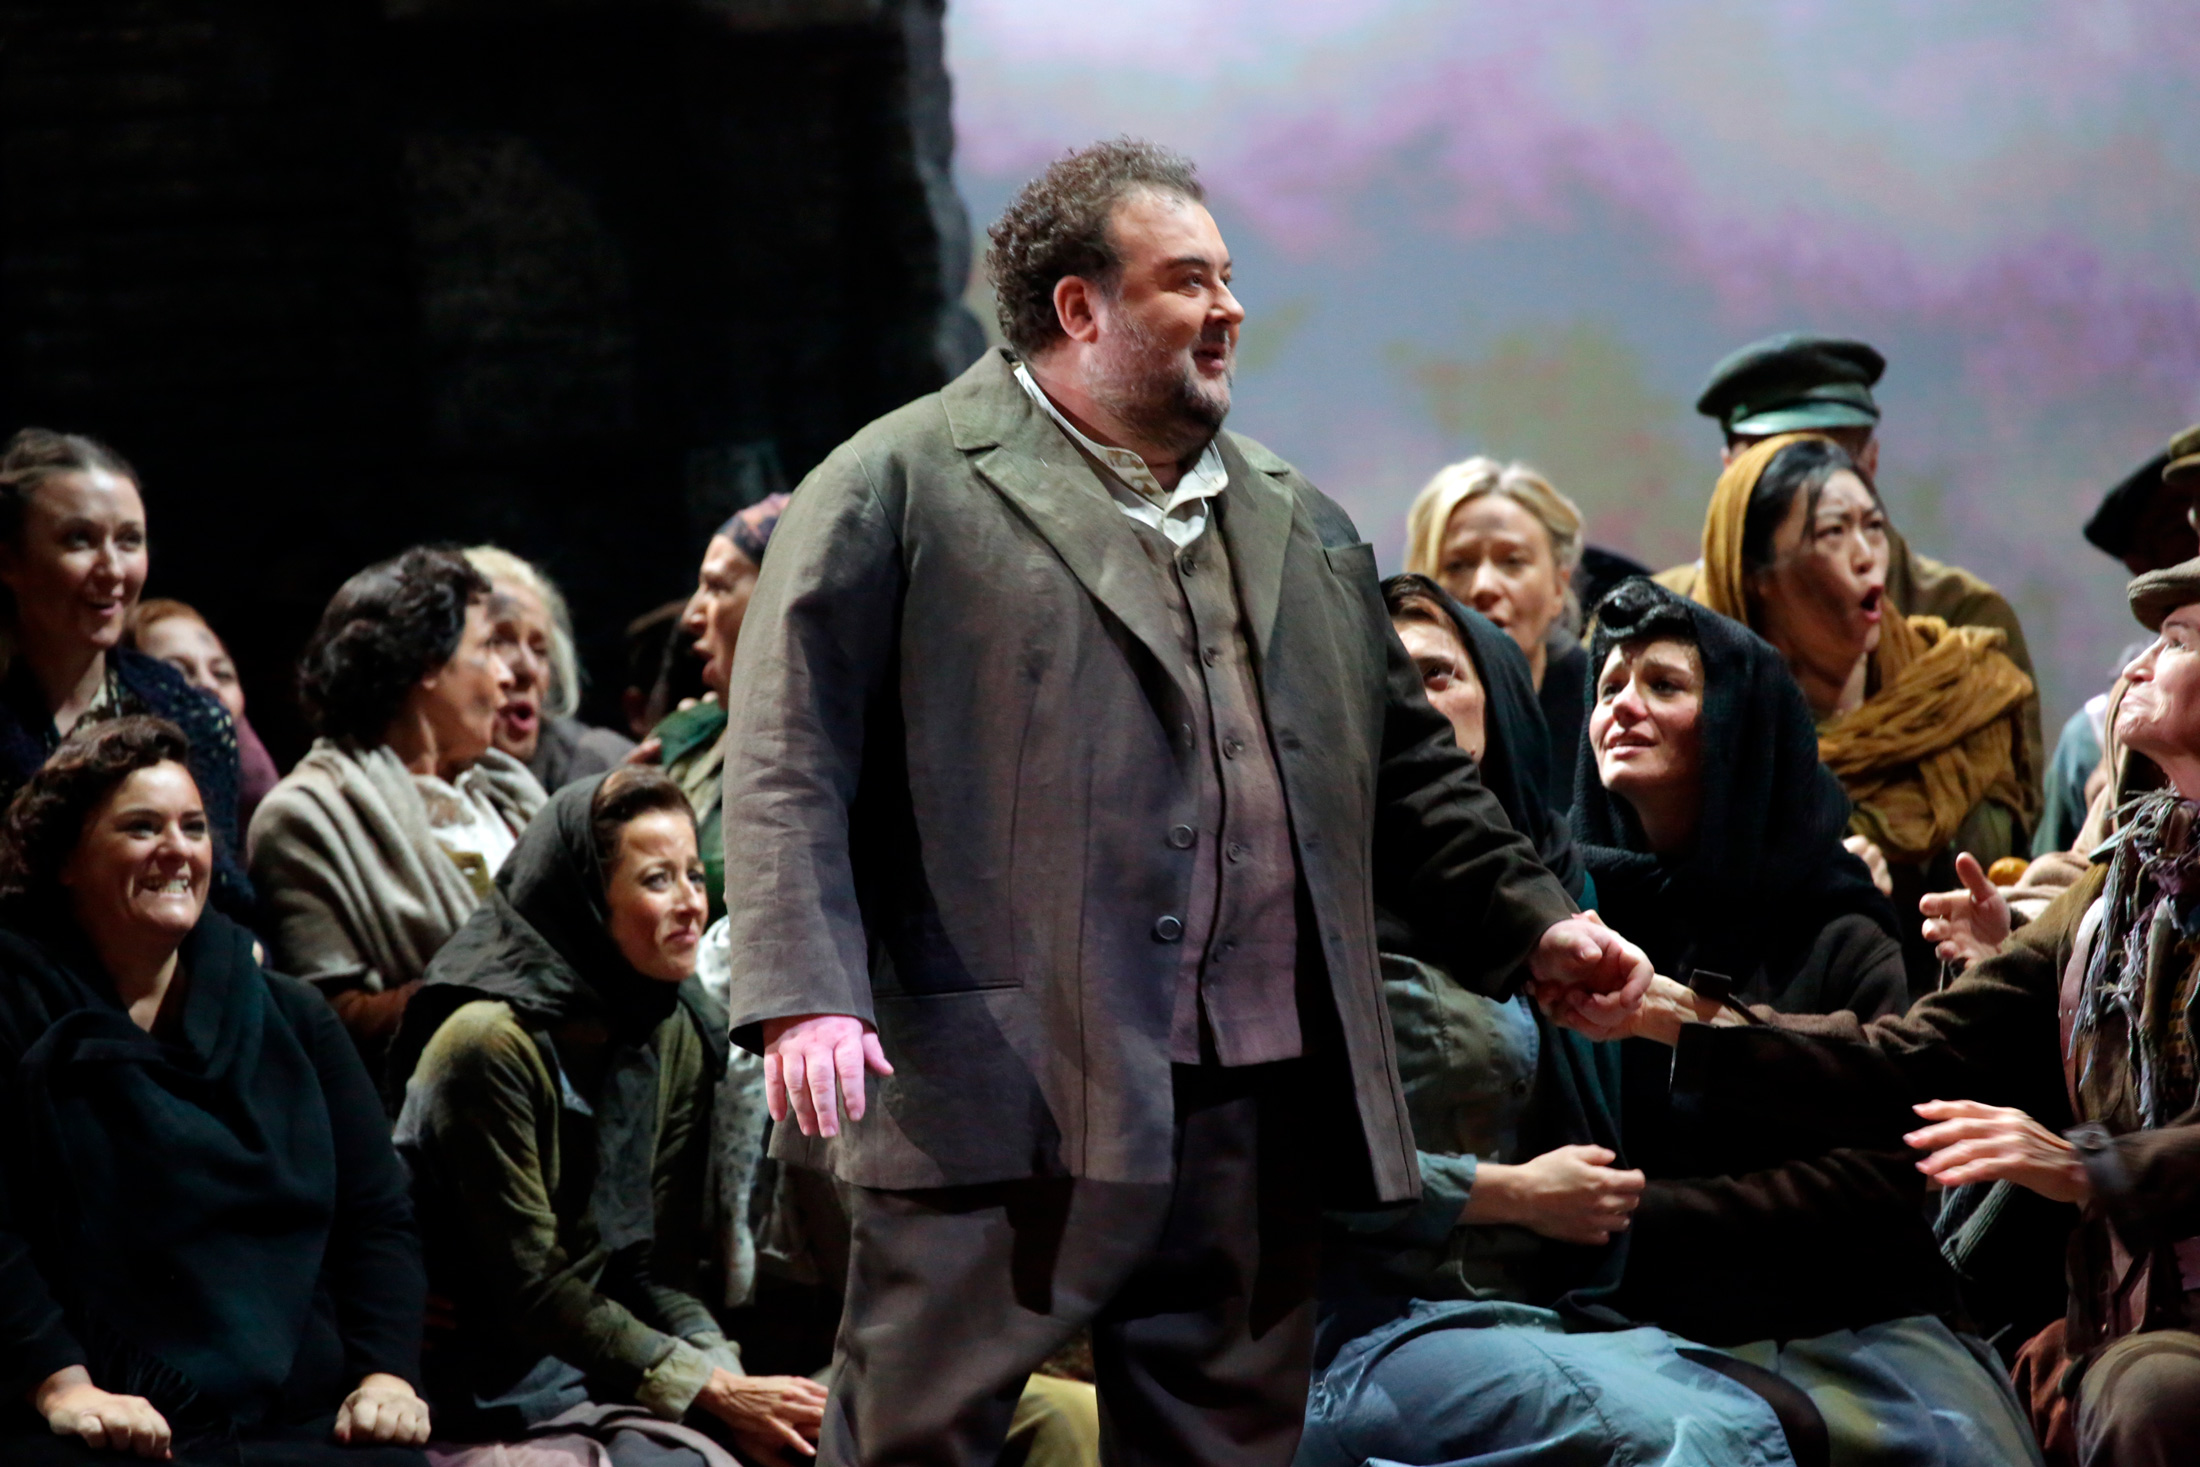 Foto: Mailänder Scala / Teatro alla scala Milano